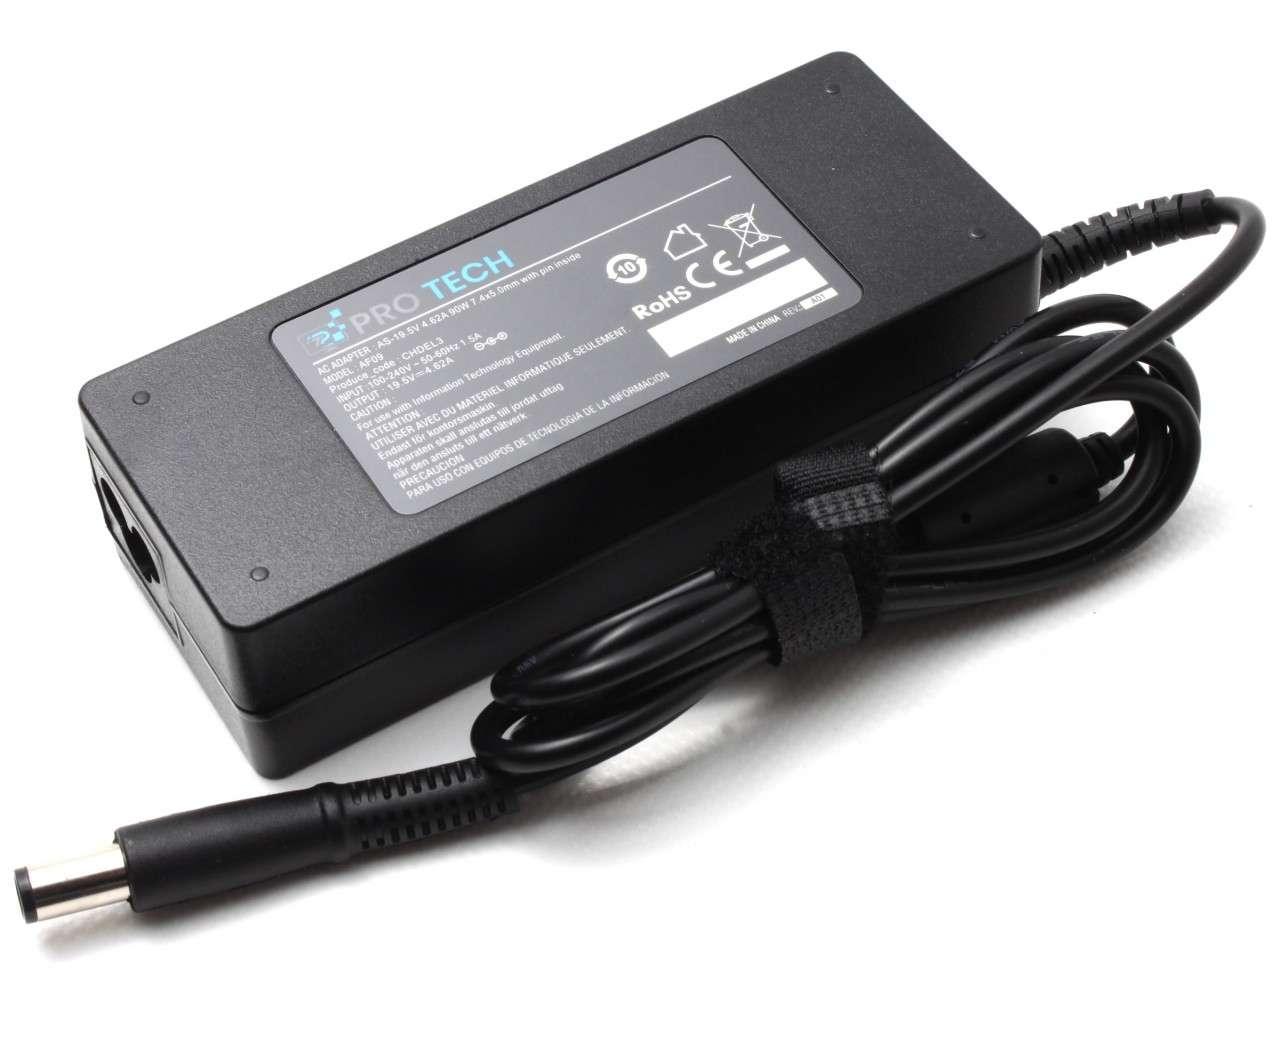 Incarcator Dell Studio 1555 Replacement imagine powerlaptop.ro 2021